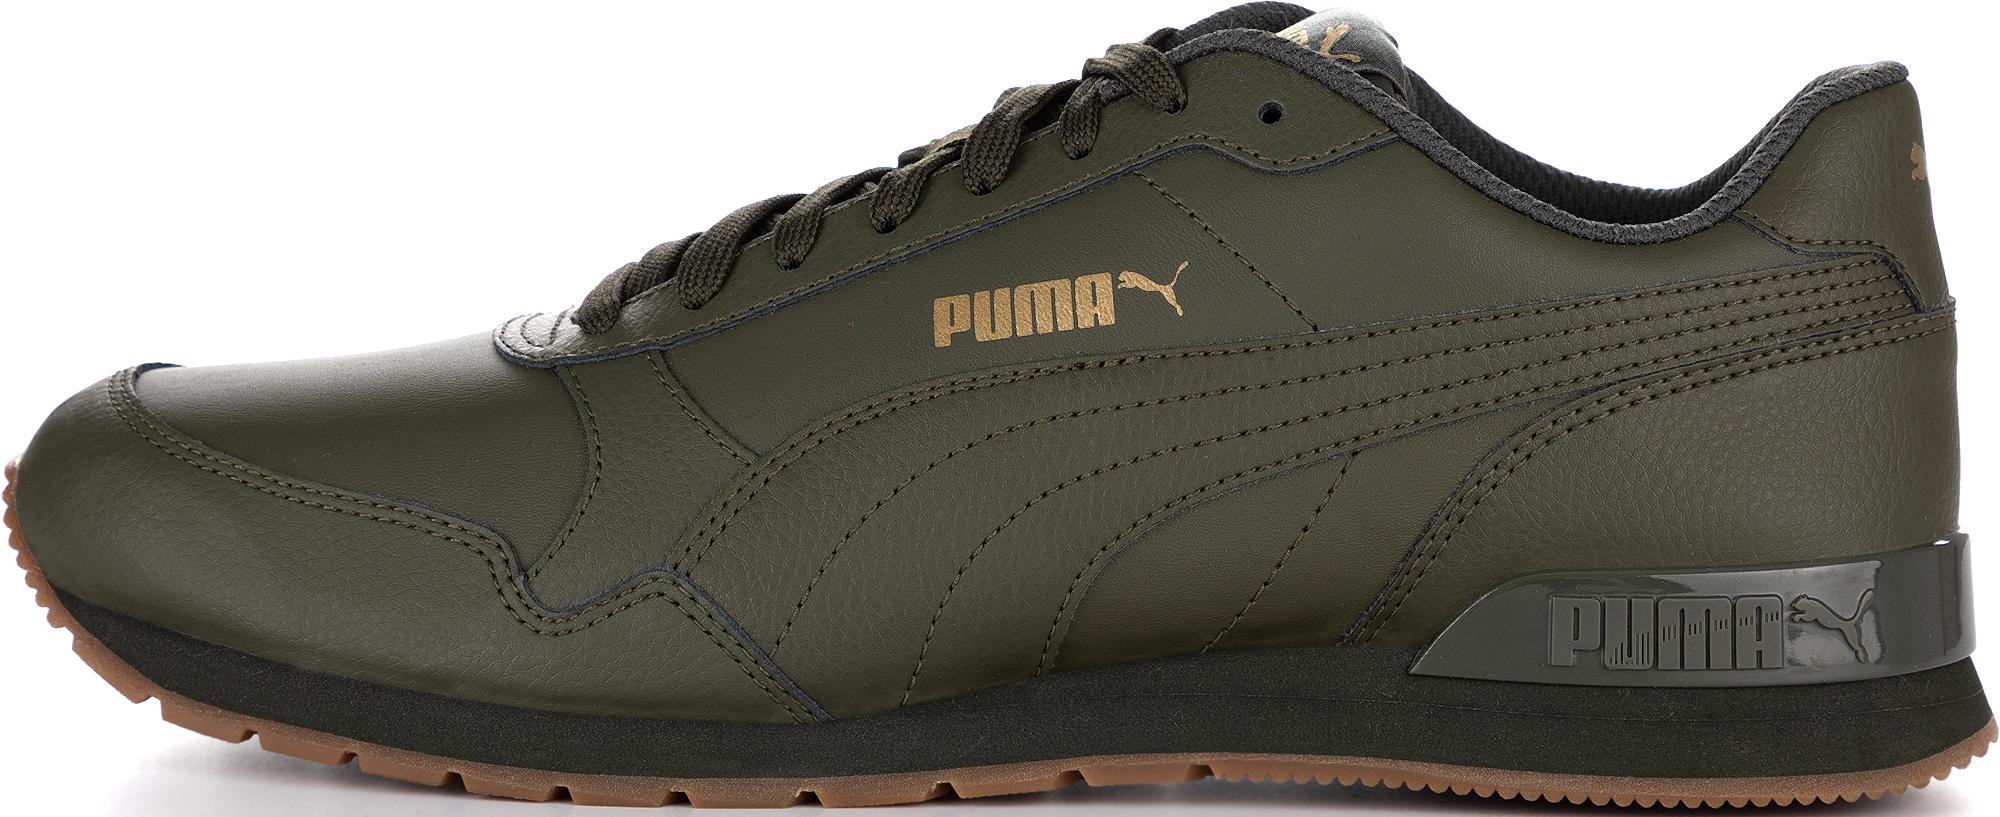 Puma Кроссовки мужские Puma St Runner, размер 42 цена